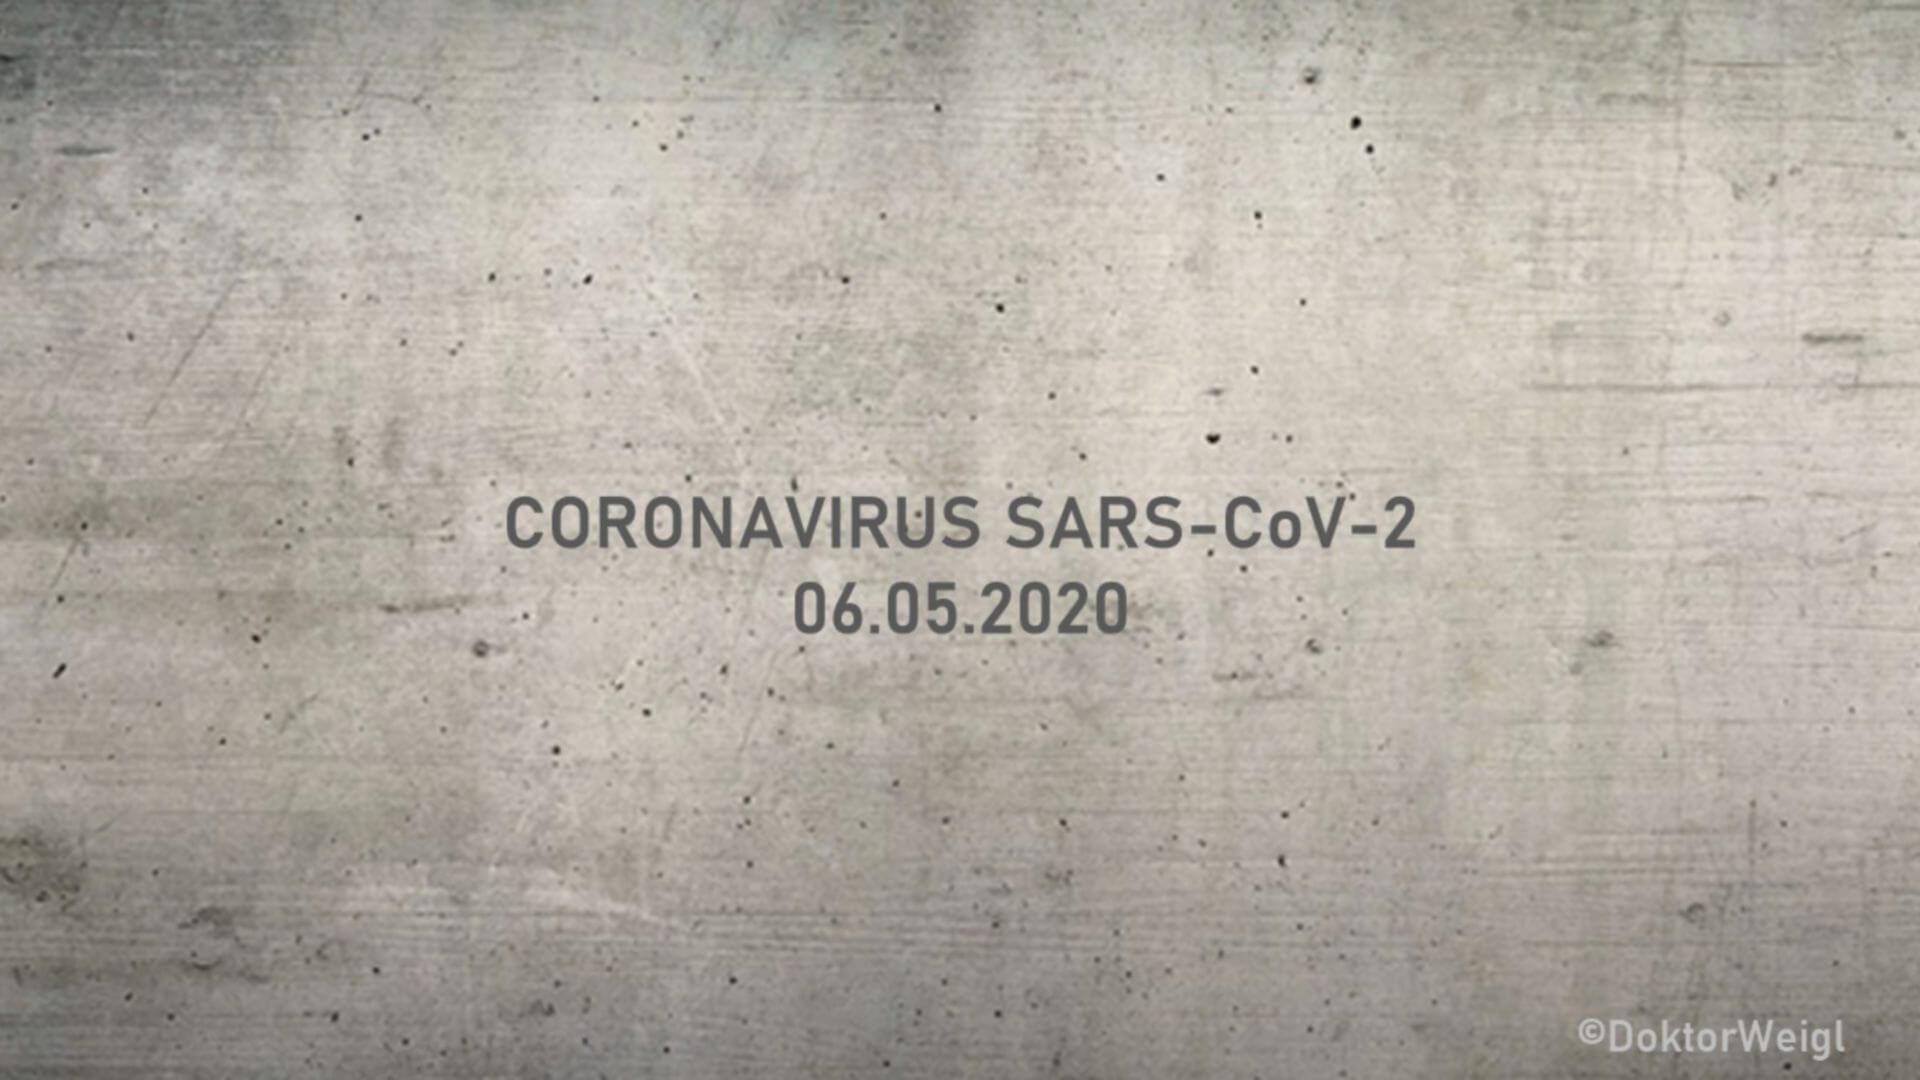 Menschlicher Antikörper neutralisiert Coronaviren